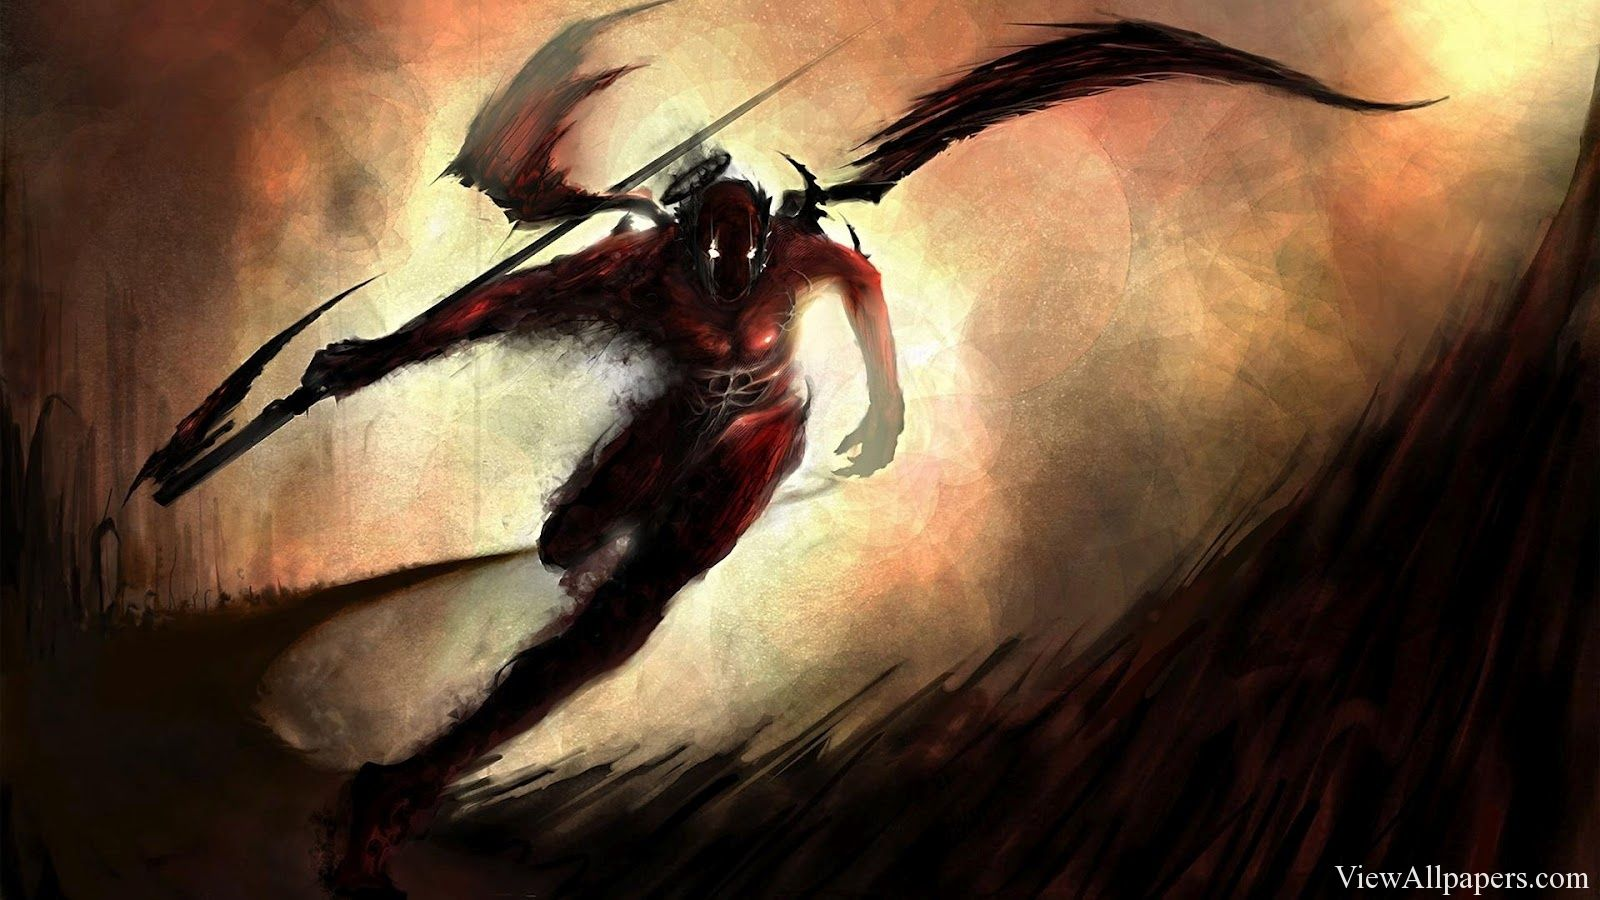 Anime dark warrior wallpaper art